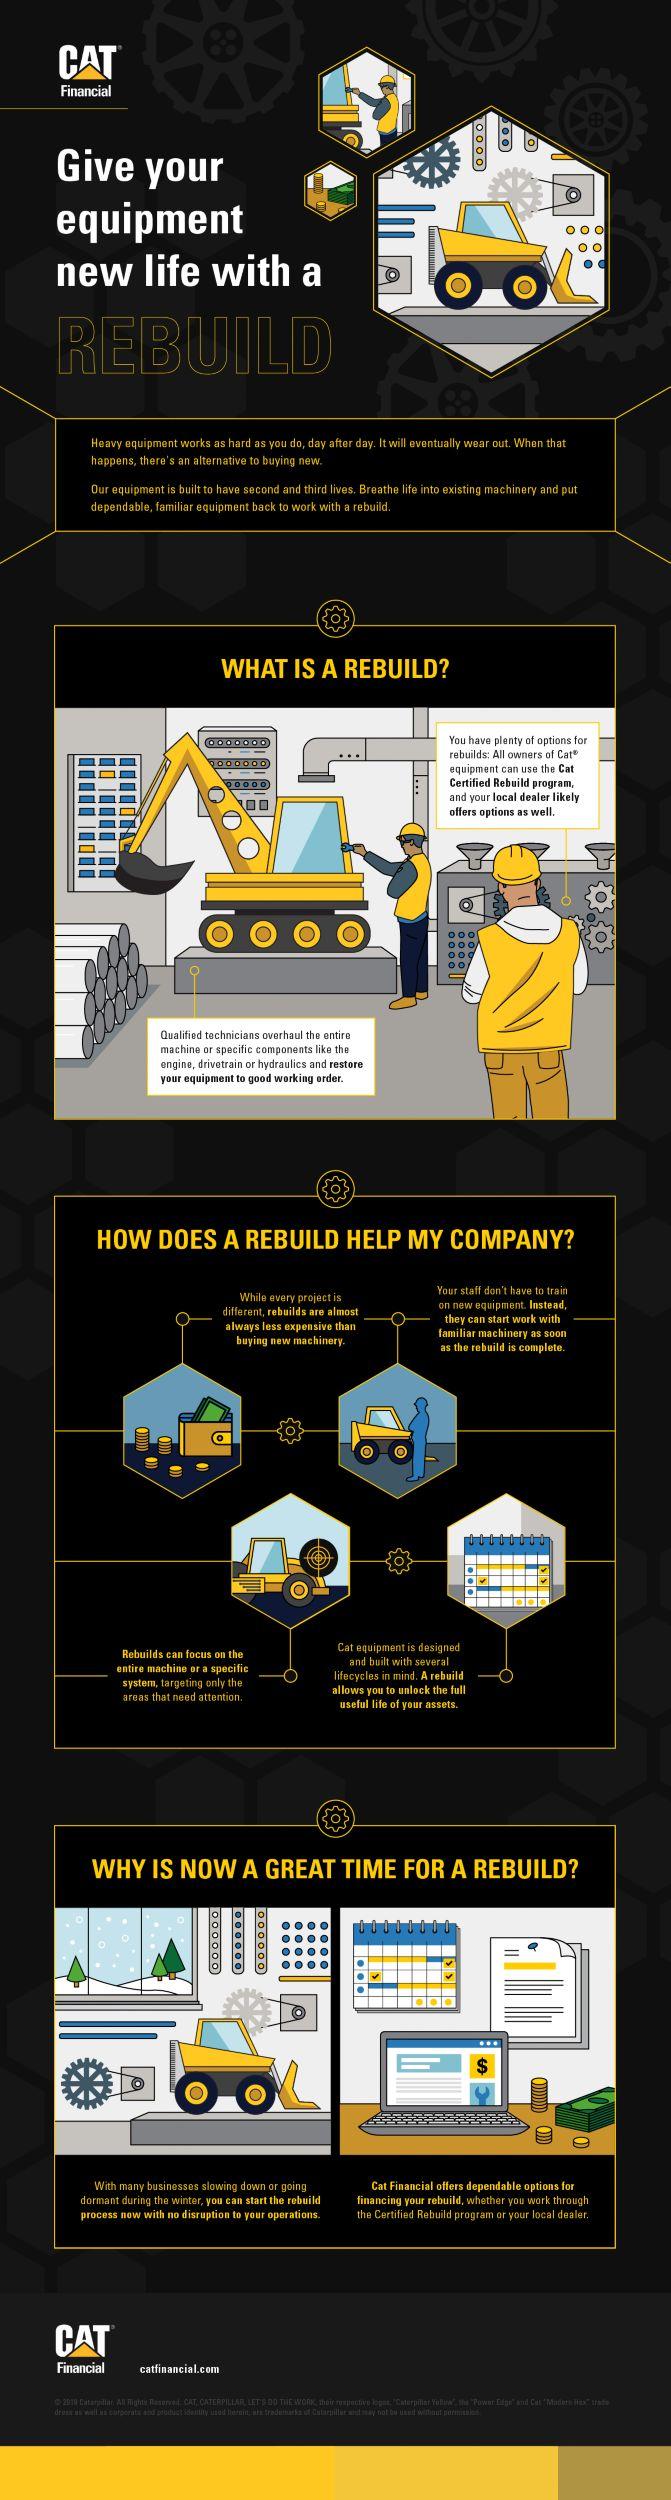 Rebuild Infographic